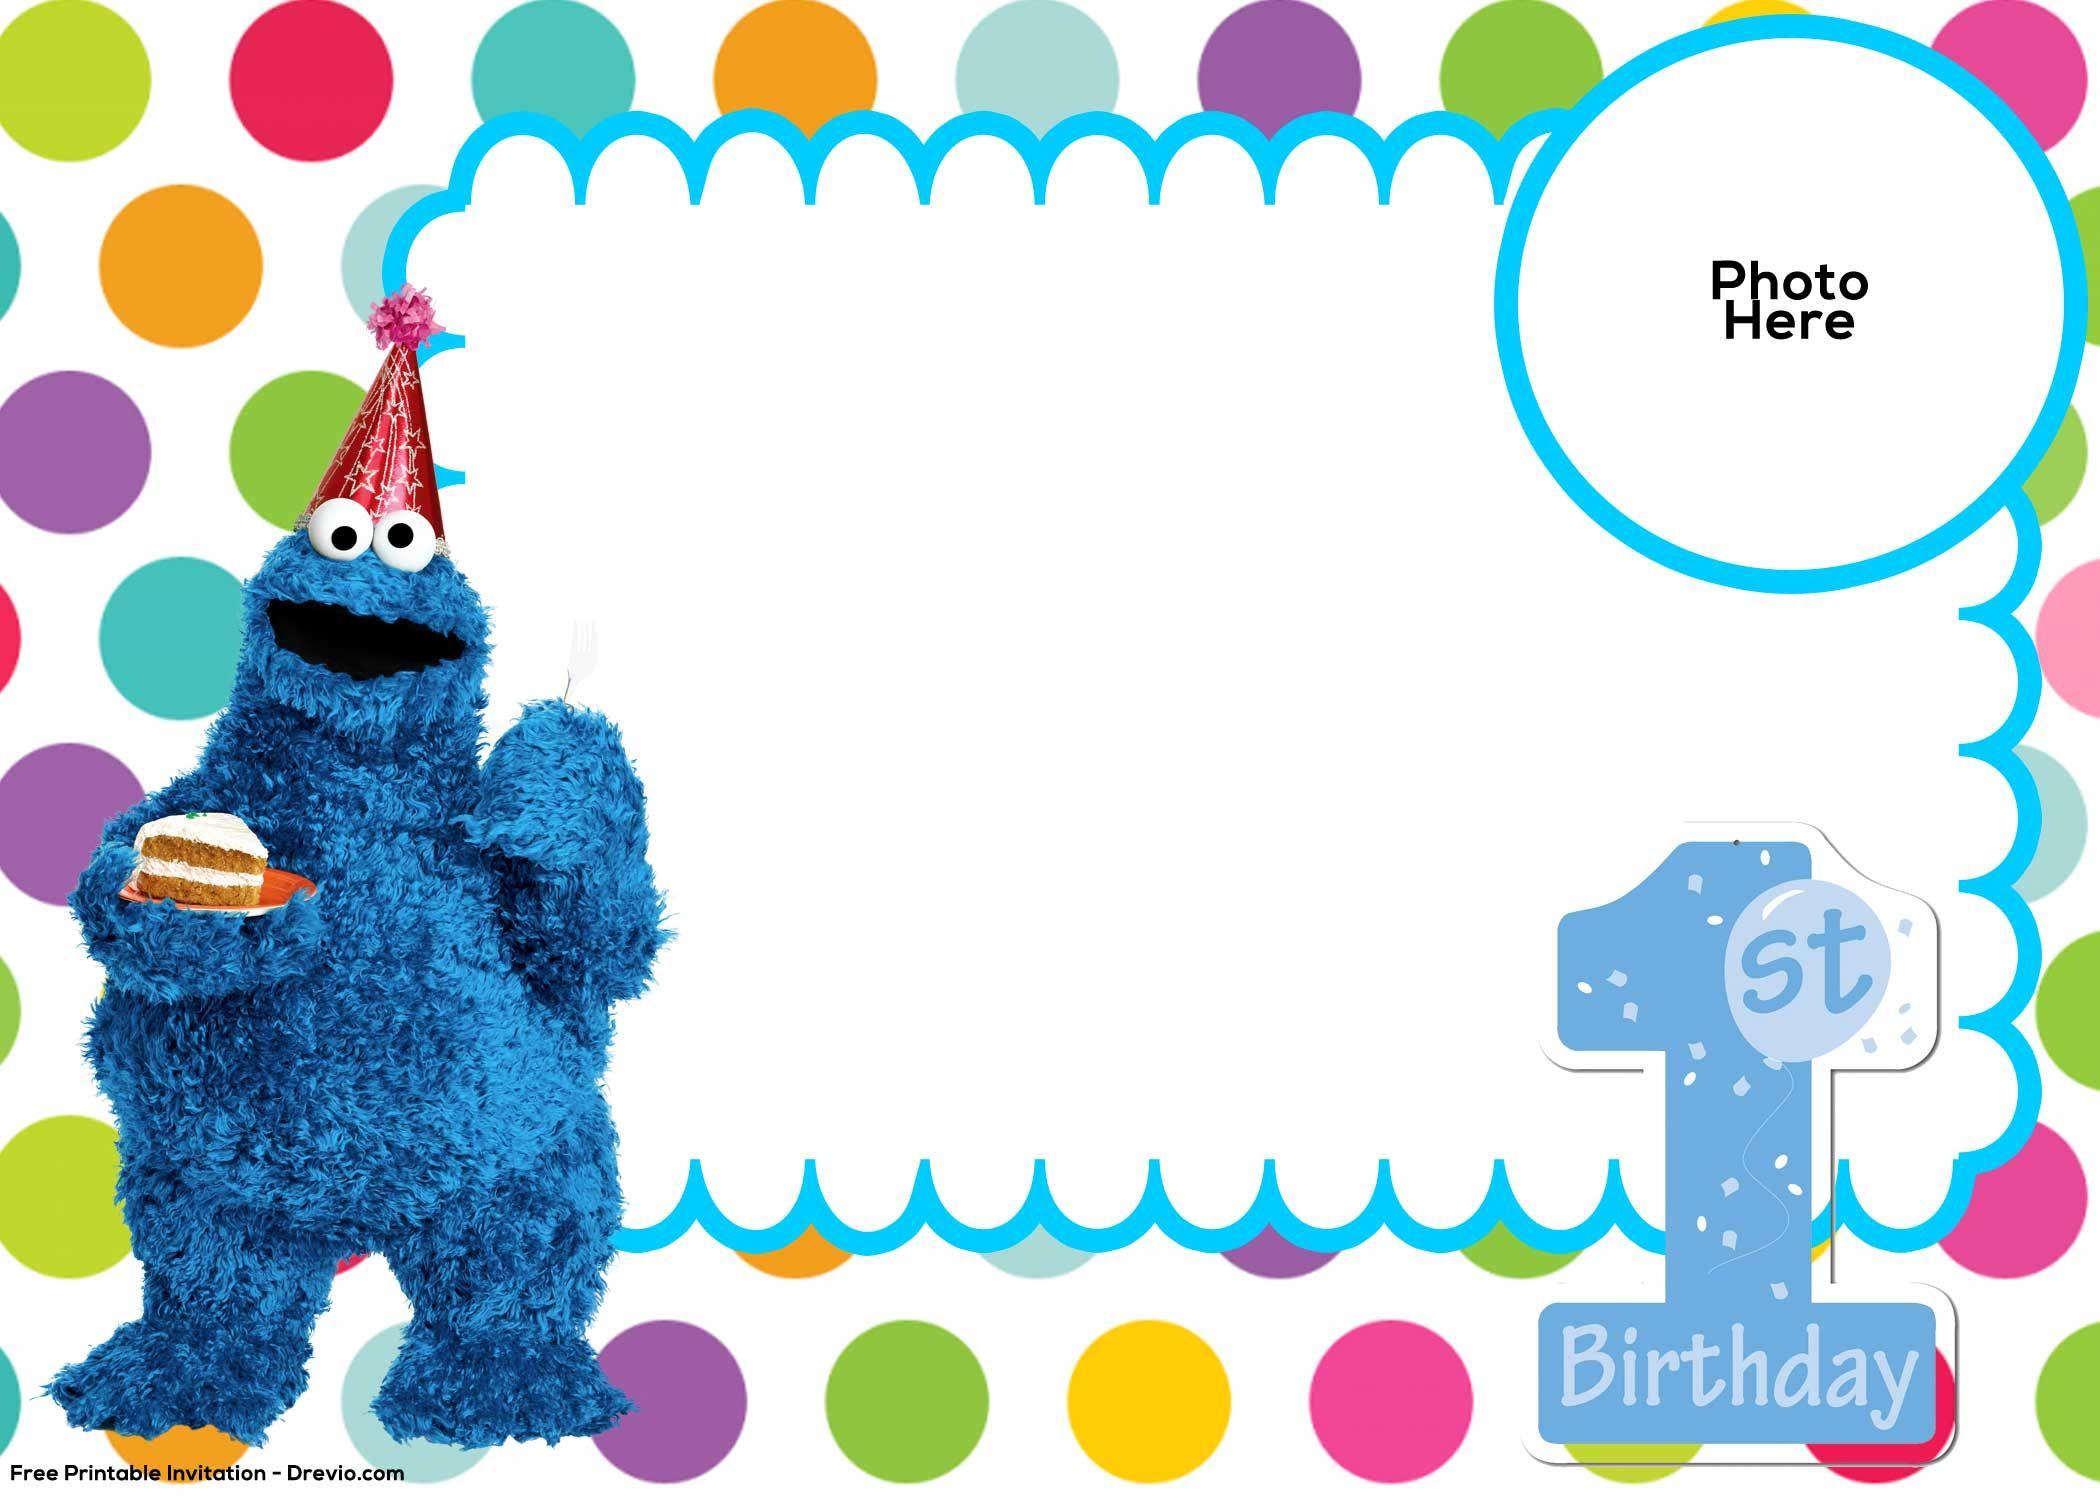 Free Sesame Street 1St Birthday Invitation | Free Printable - Free Printable Cookie Monster Birthday Invitations